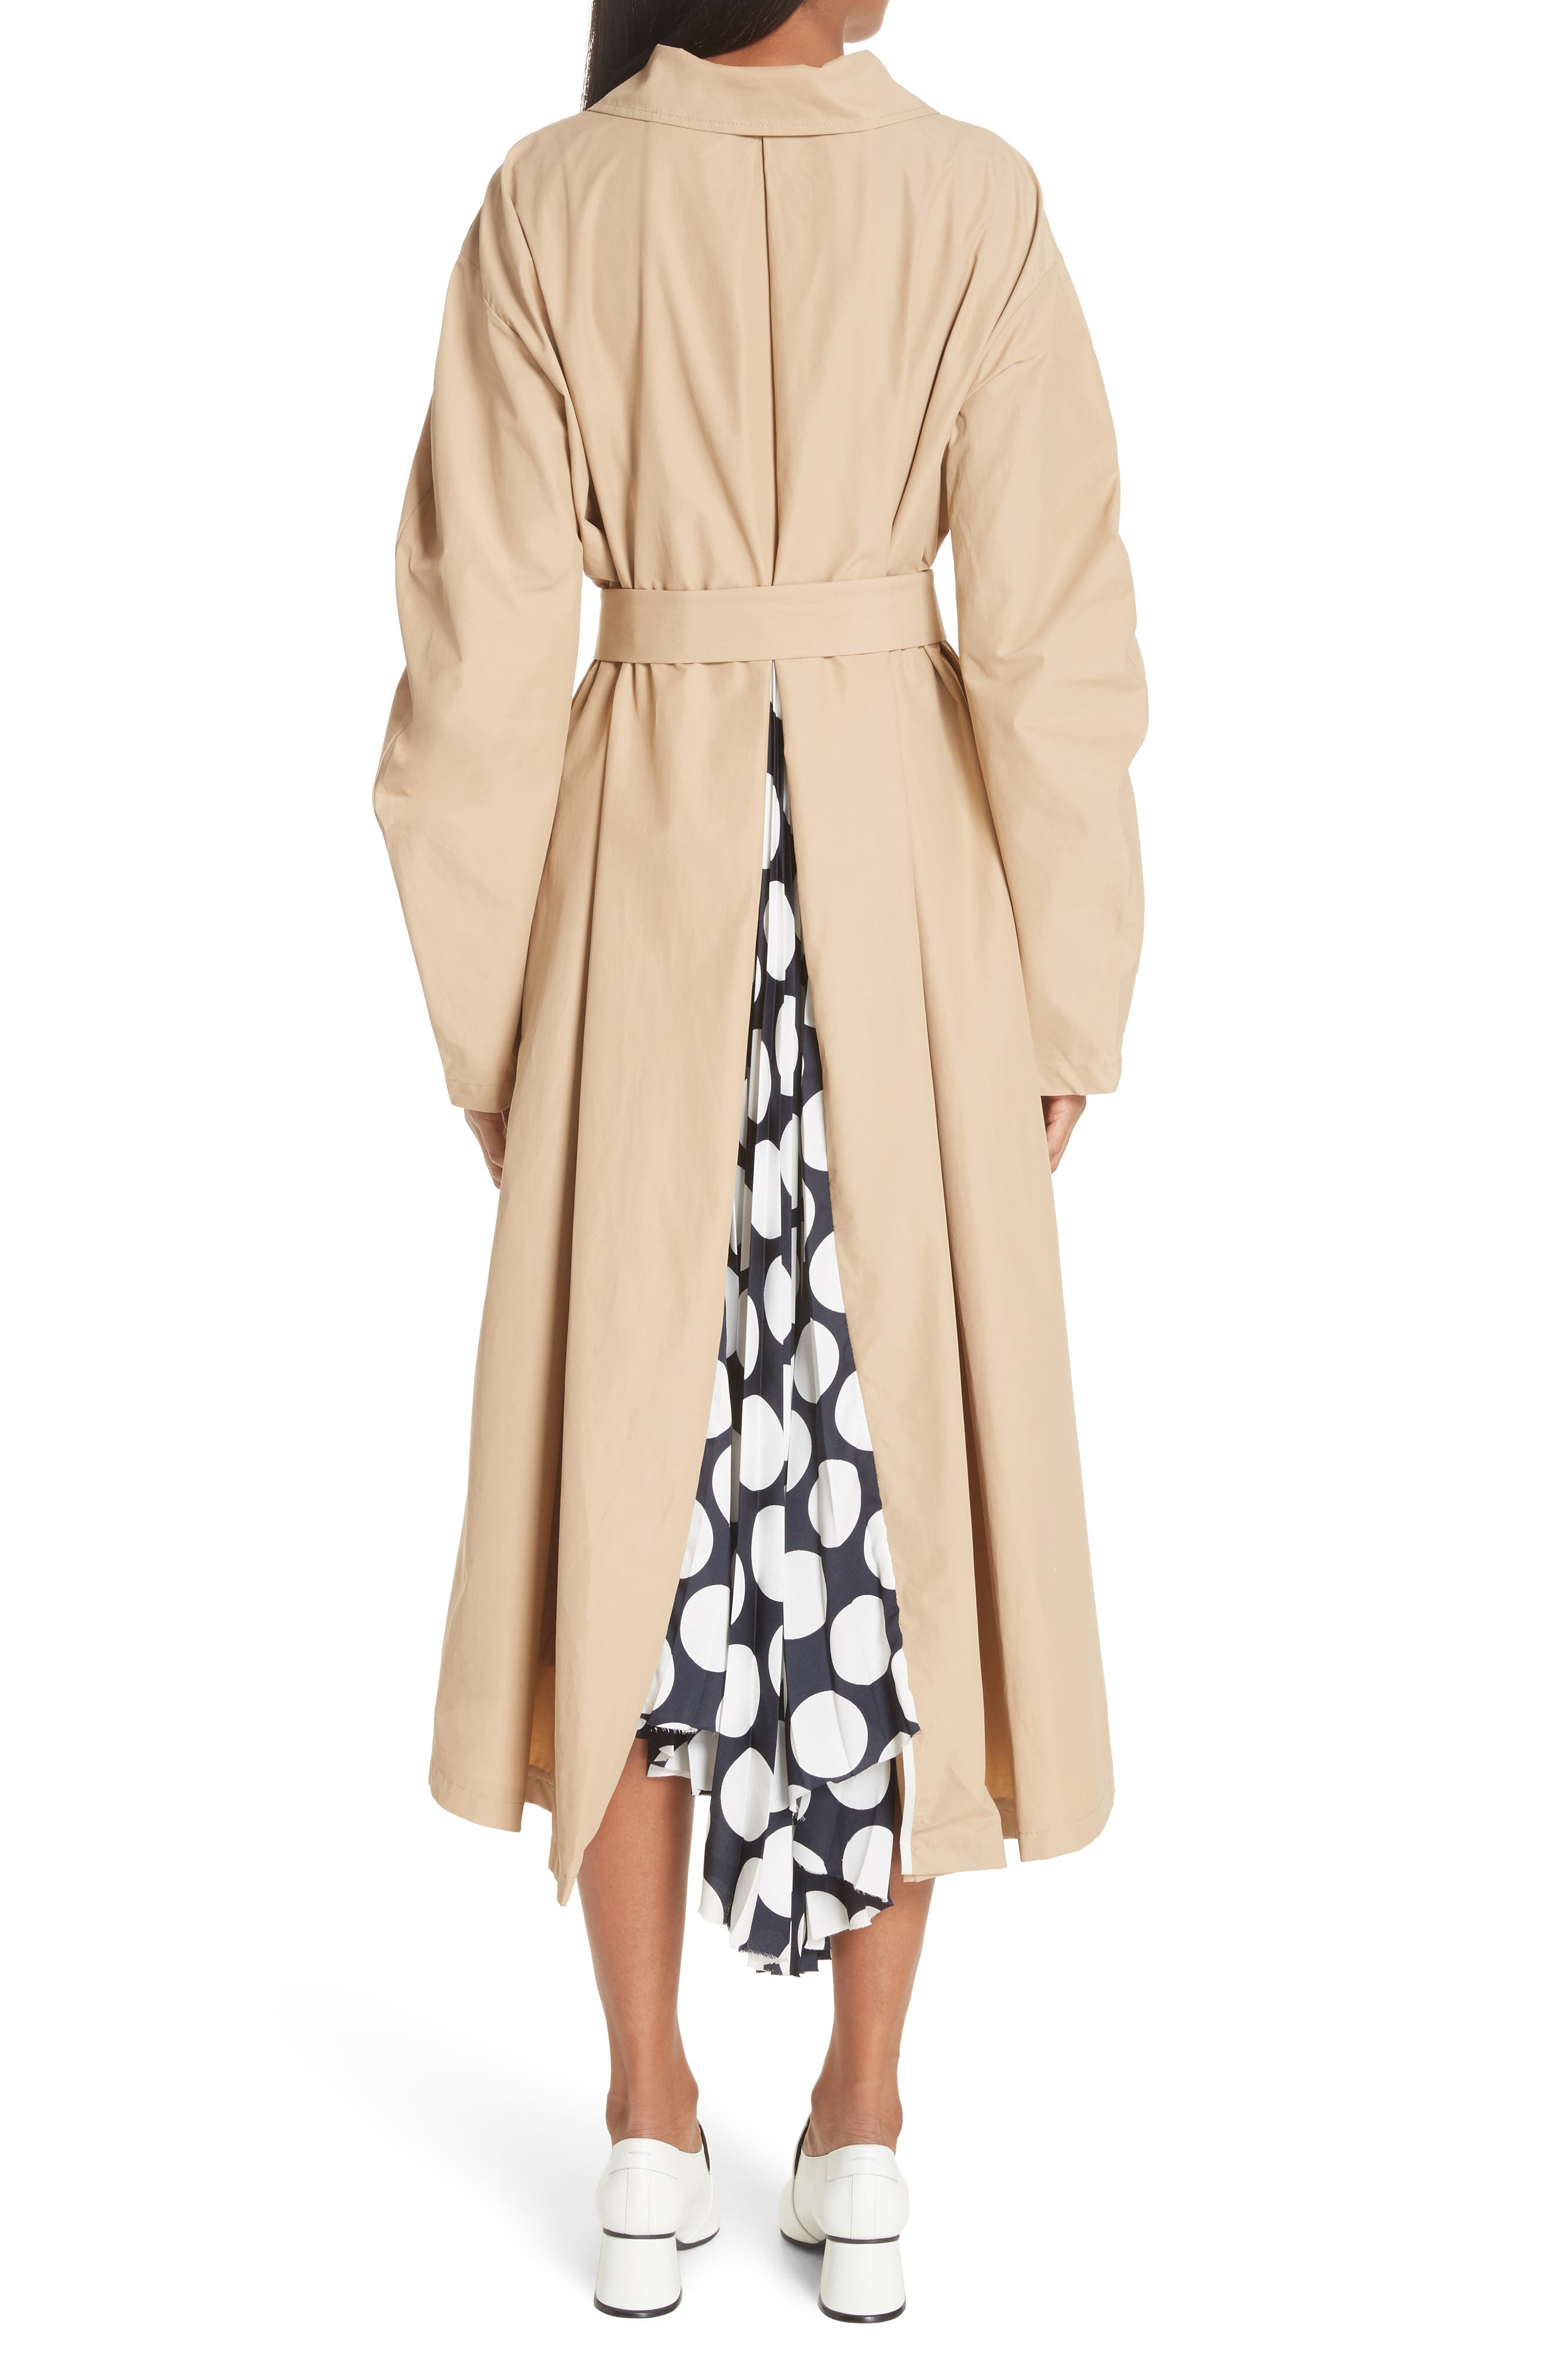 Round Sleeve Coat with Polka Dot Back Panel,                             Alternate thumbnail 2, color,